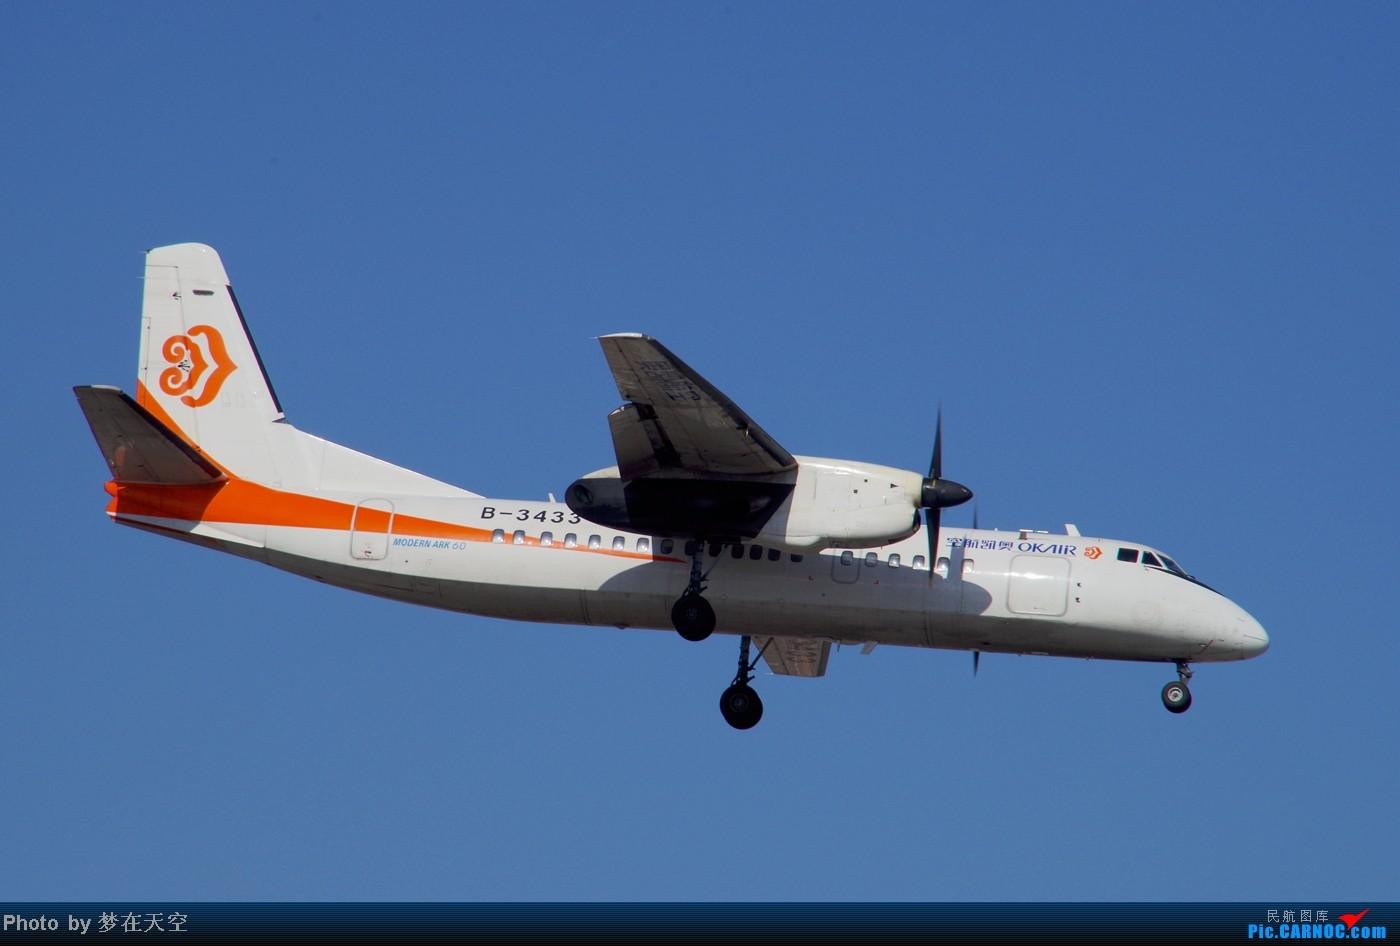 Re:[原创]【DLC拍机】 不要问DLC有啥机型 要看DLC不缺啥 XIAN AIRCRAFT INDUSTRY MA-60 B-3433 中国大连周水子机场